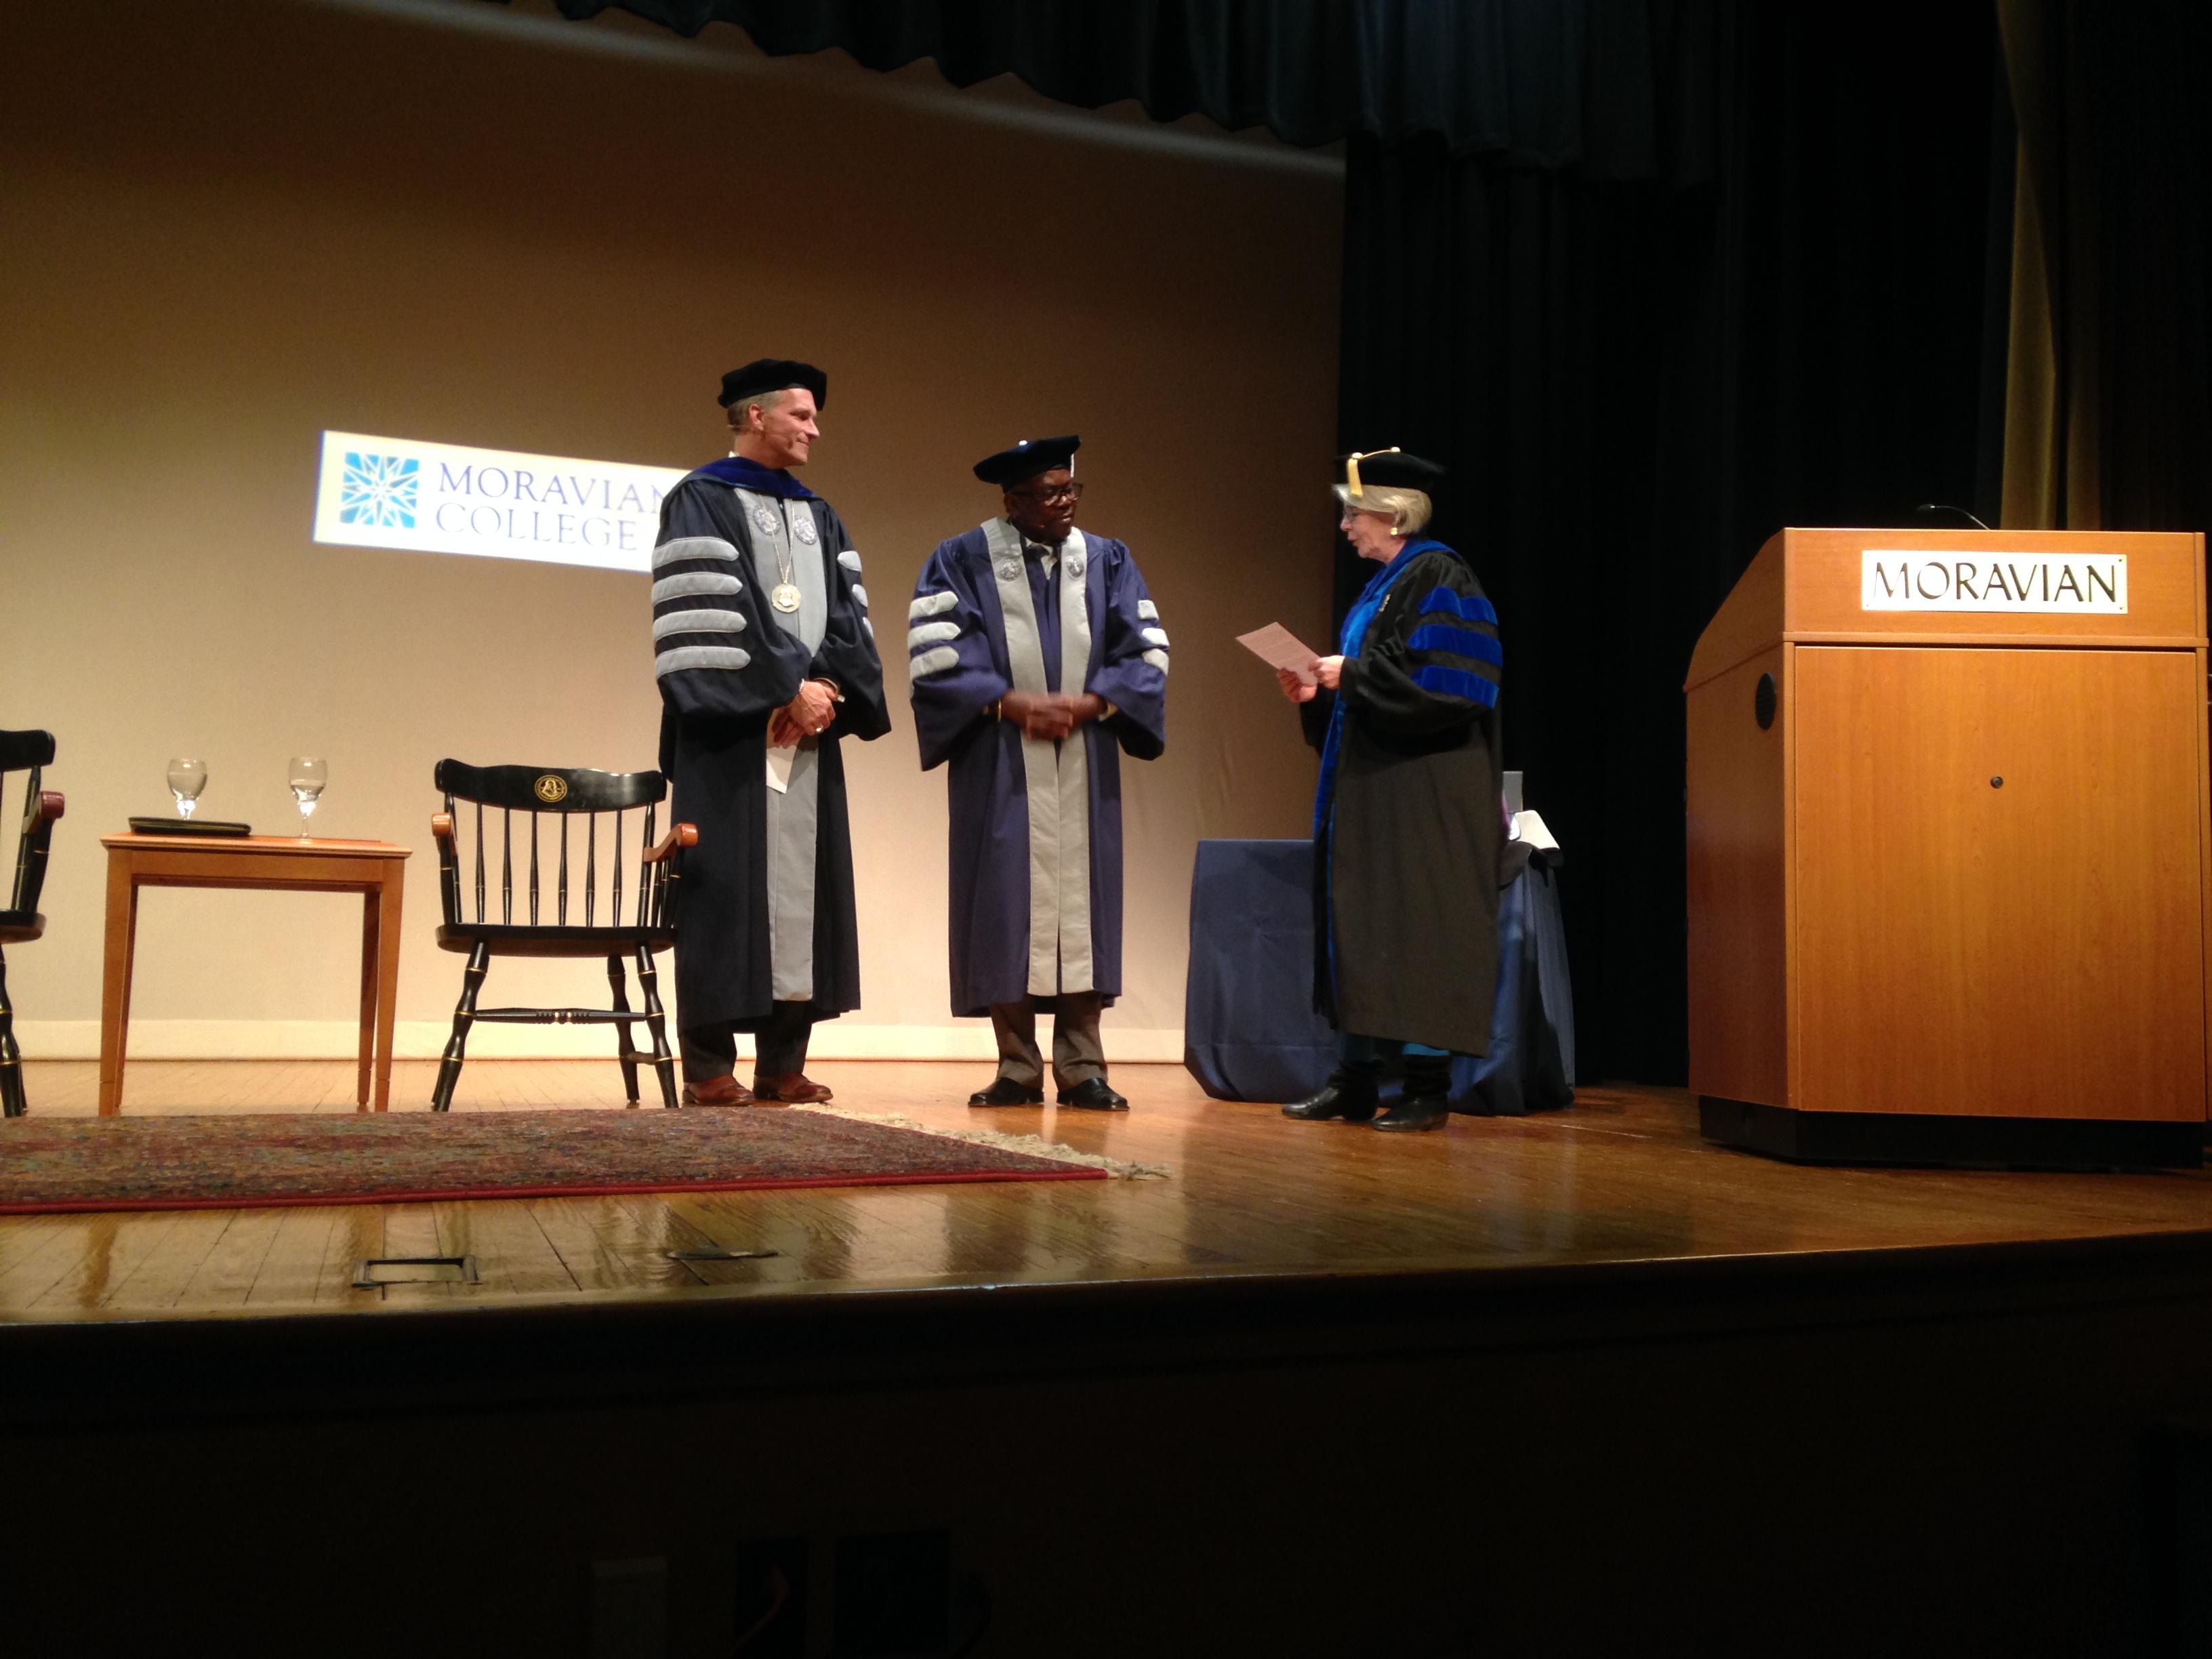 Mario Moravian College award